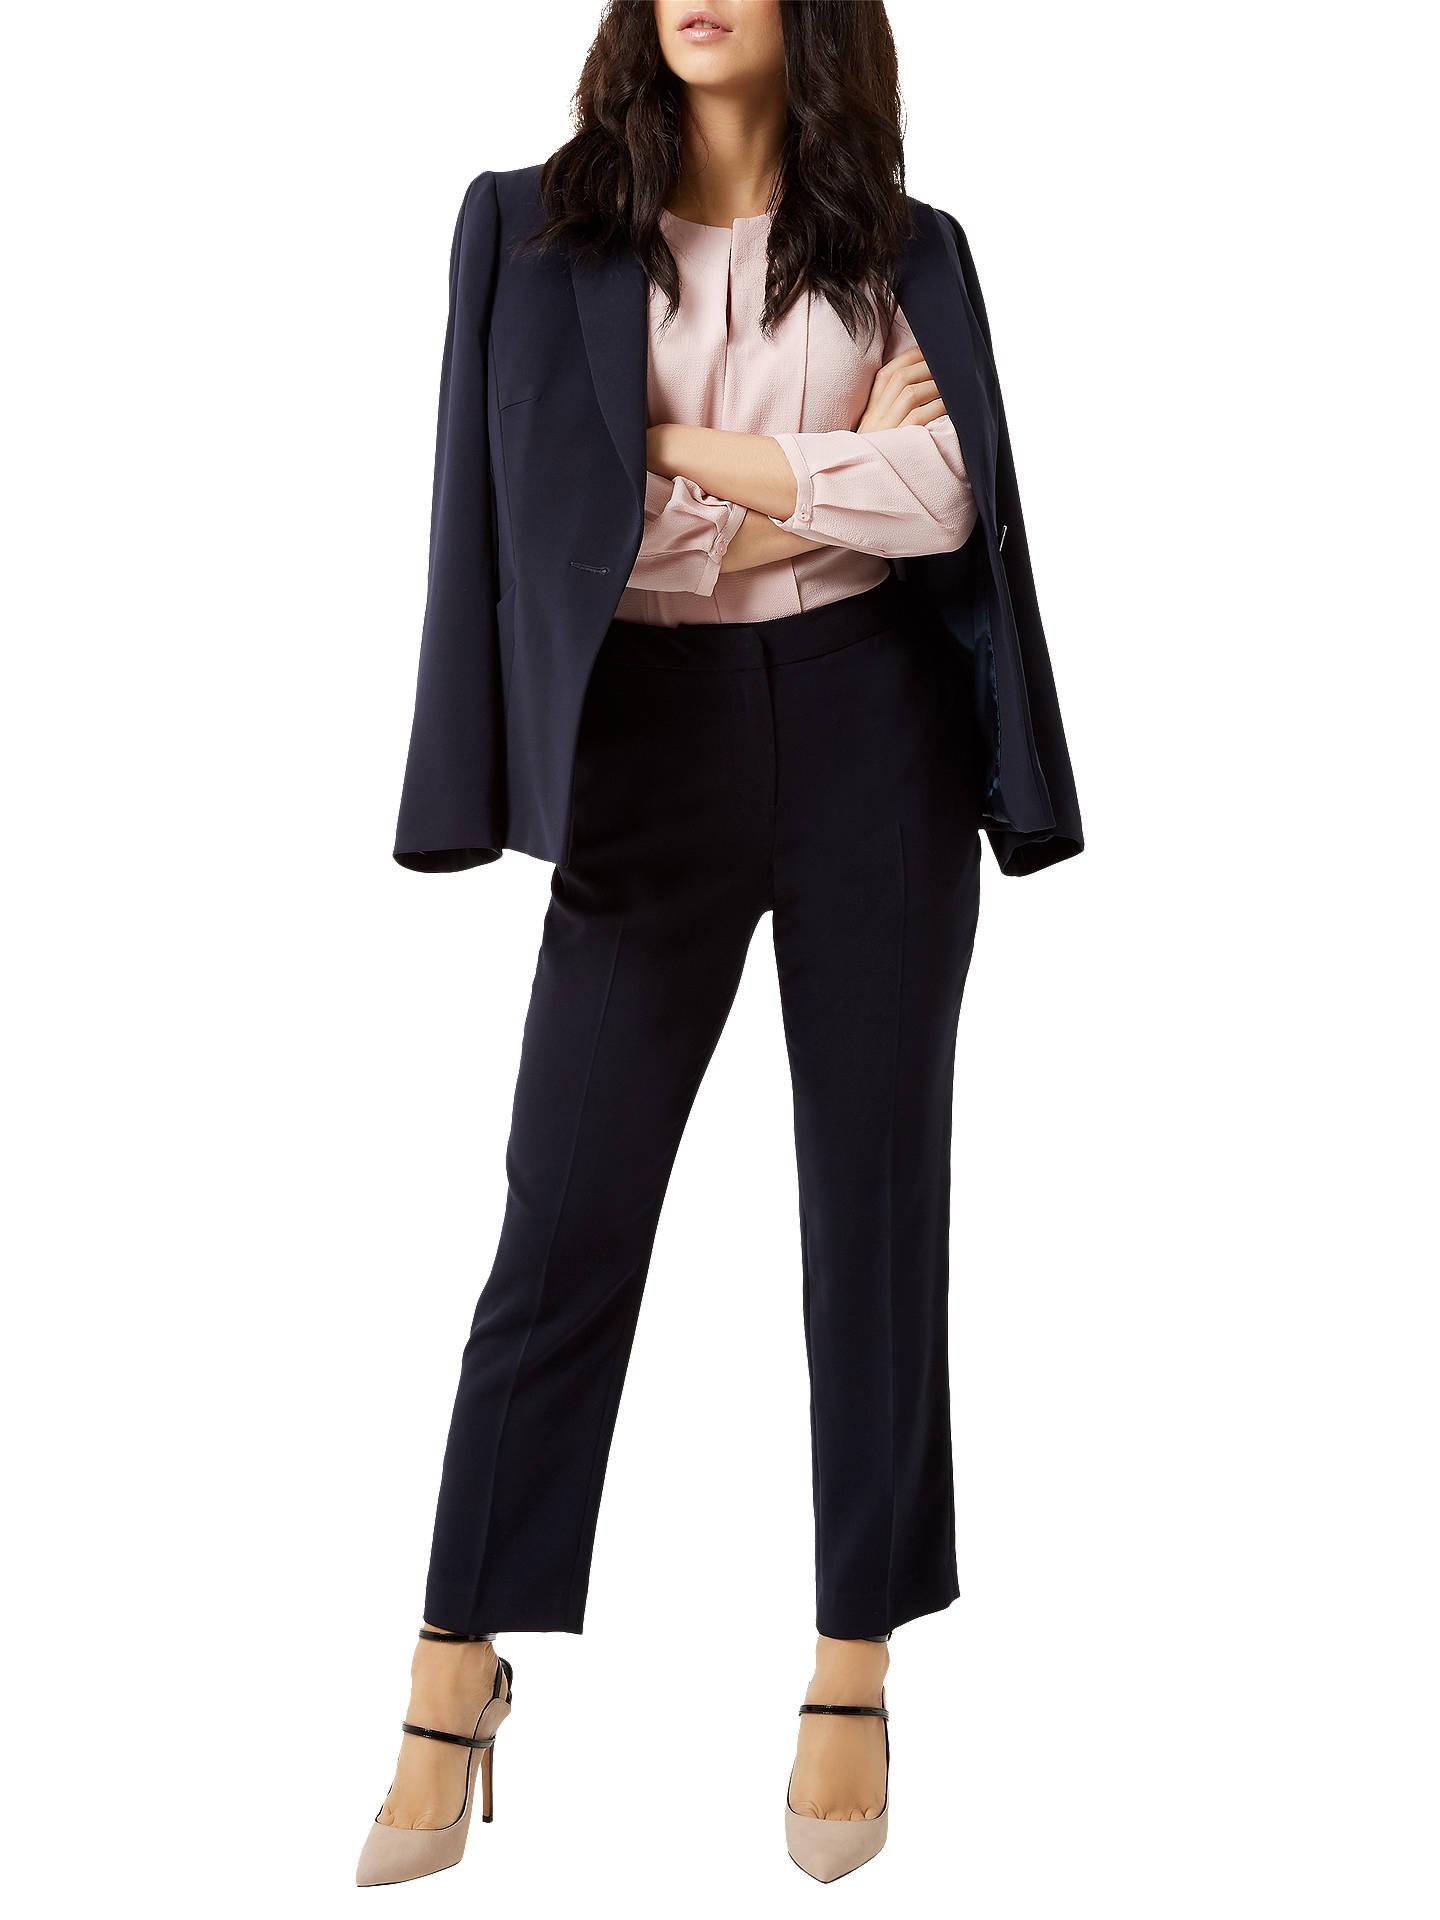 20f55edb3249 ... Buy Fenn Wright Manson Petite Harper Trousers, Navy, 8 Online at  johnlewis.com ...